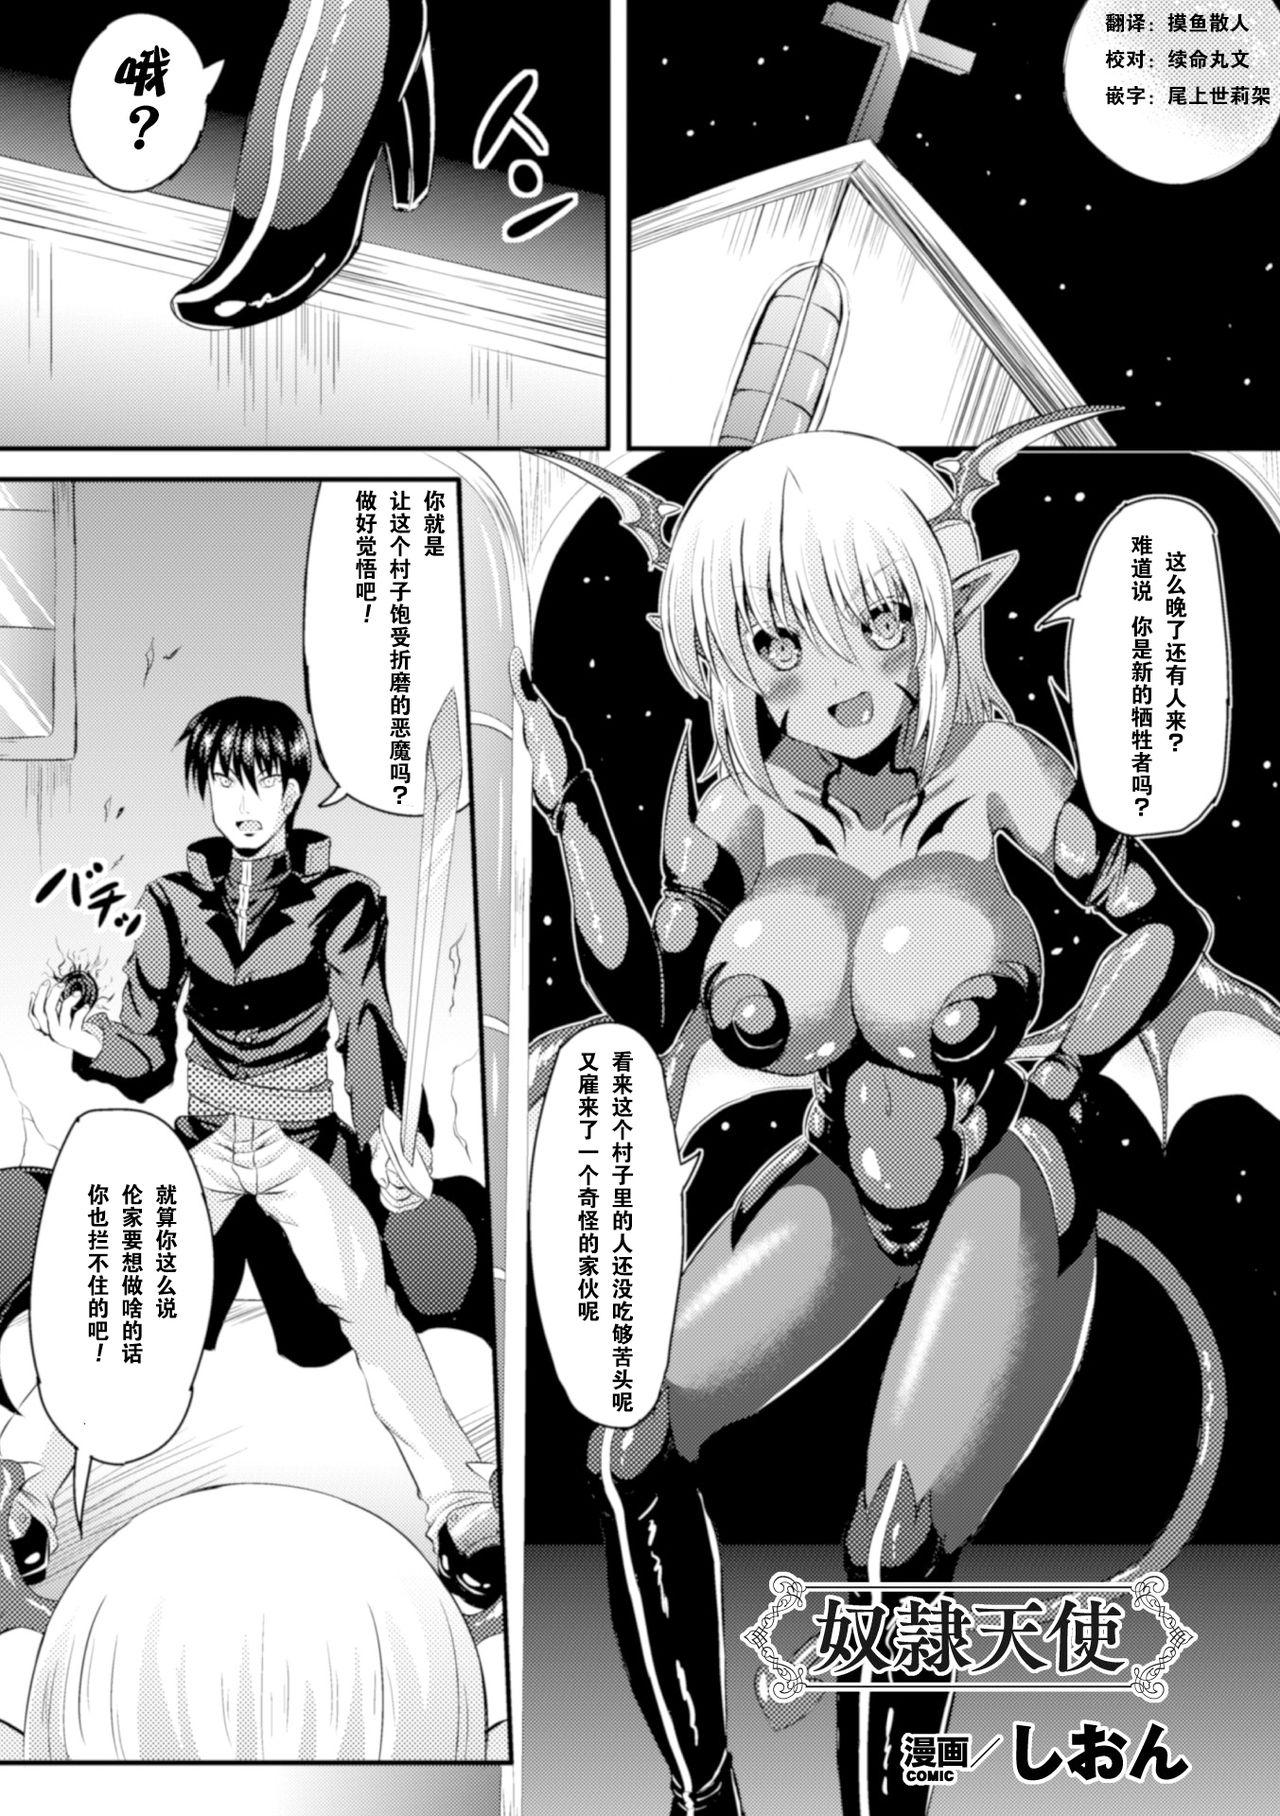 2D Comic Magazine Tenshi ni Ochiru Akuma-tachi Vol. 1 44